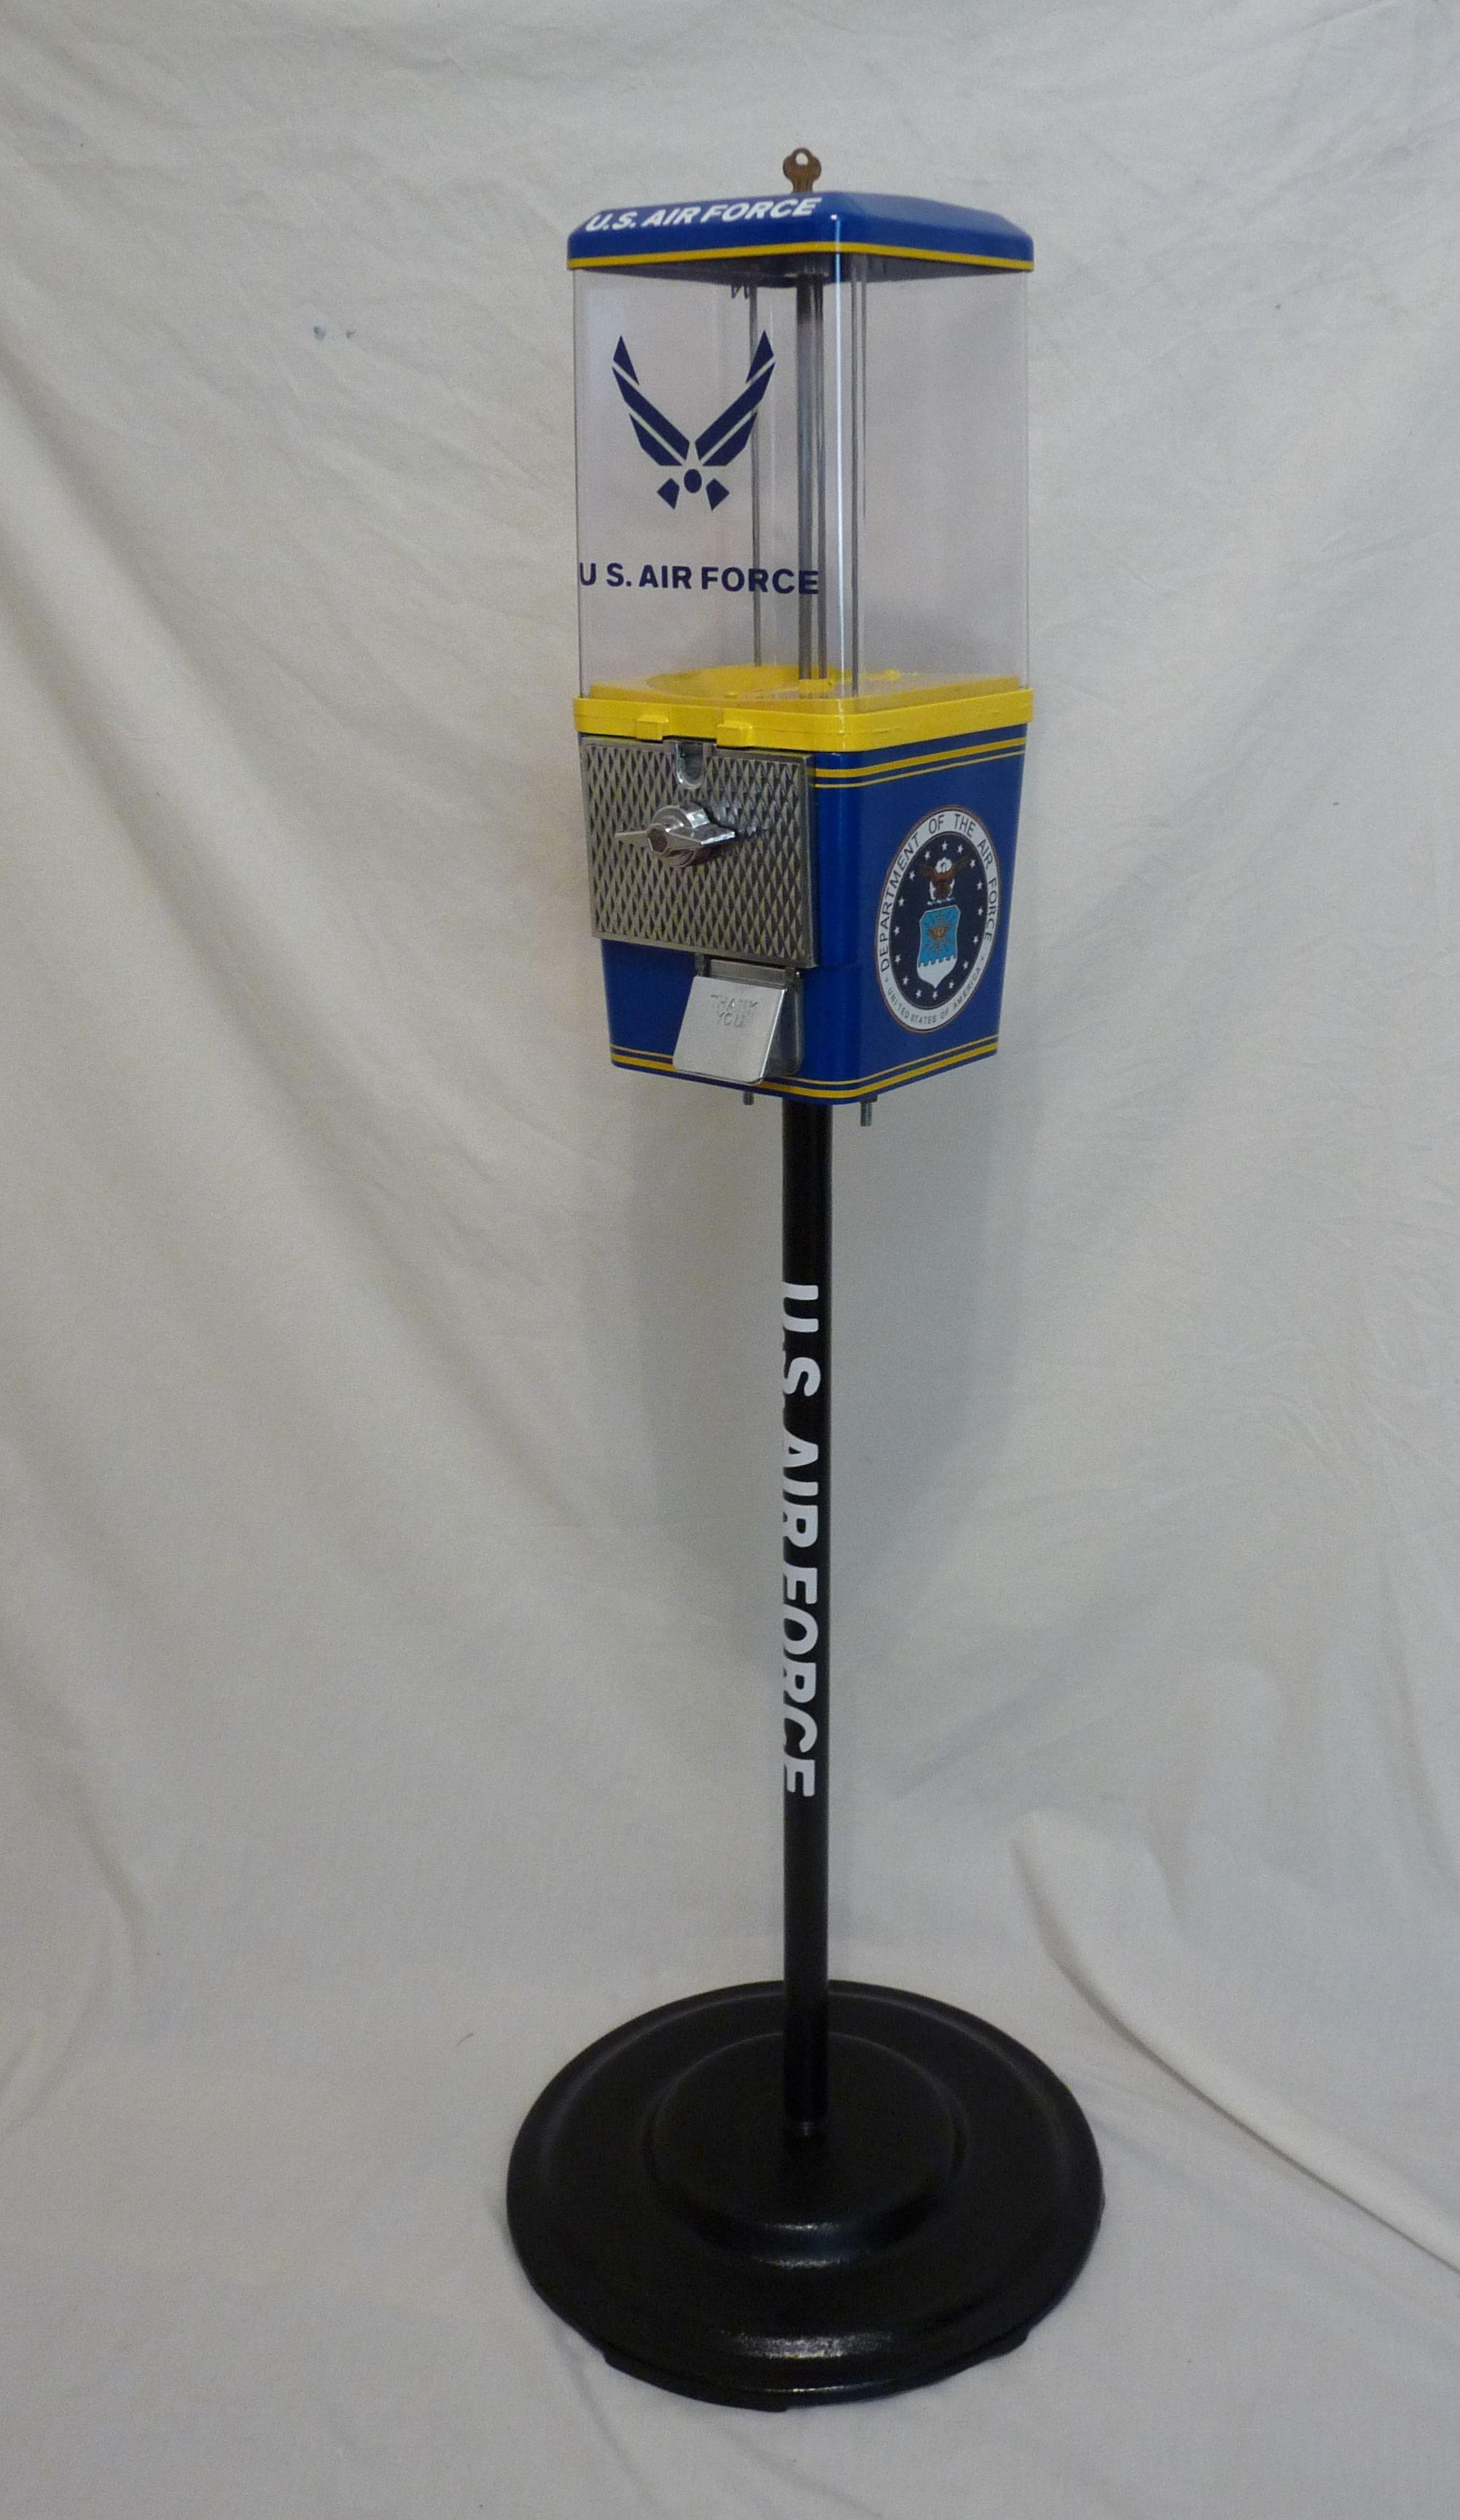 U. S Air Force custom gumball machine themed U>S Air force